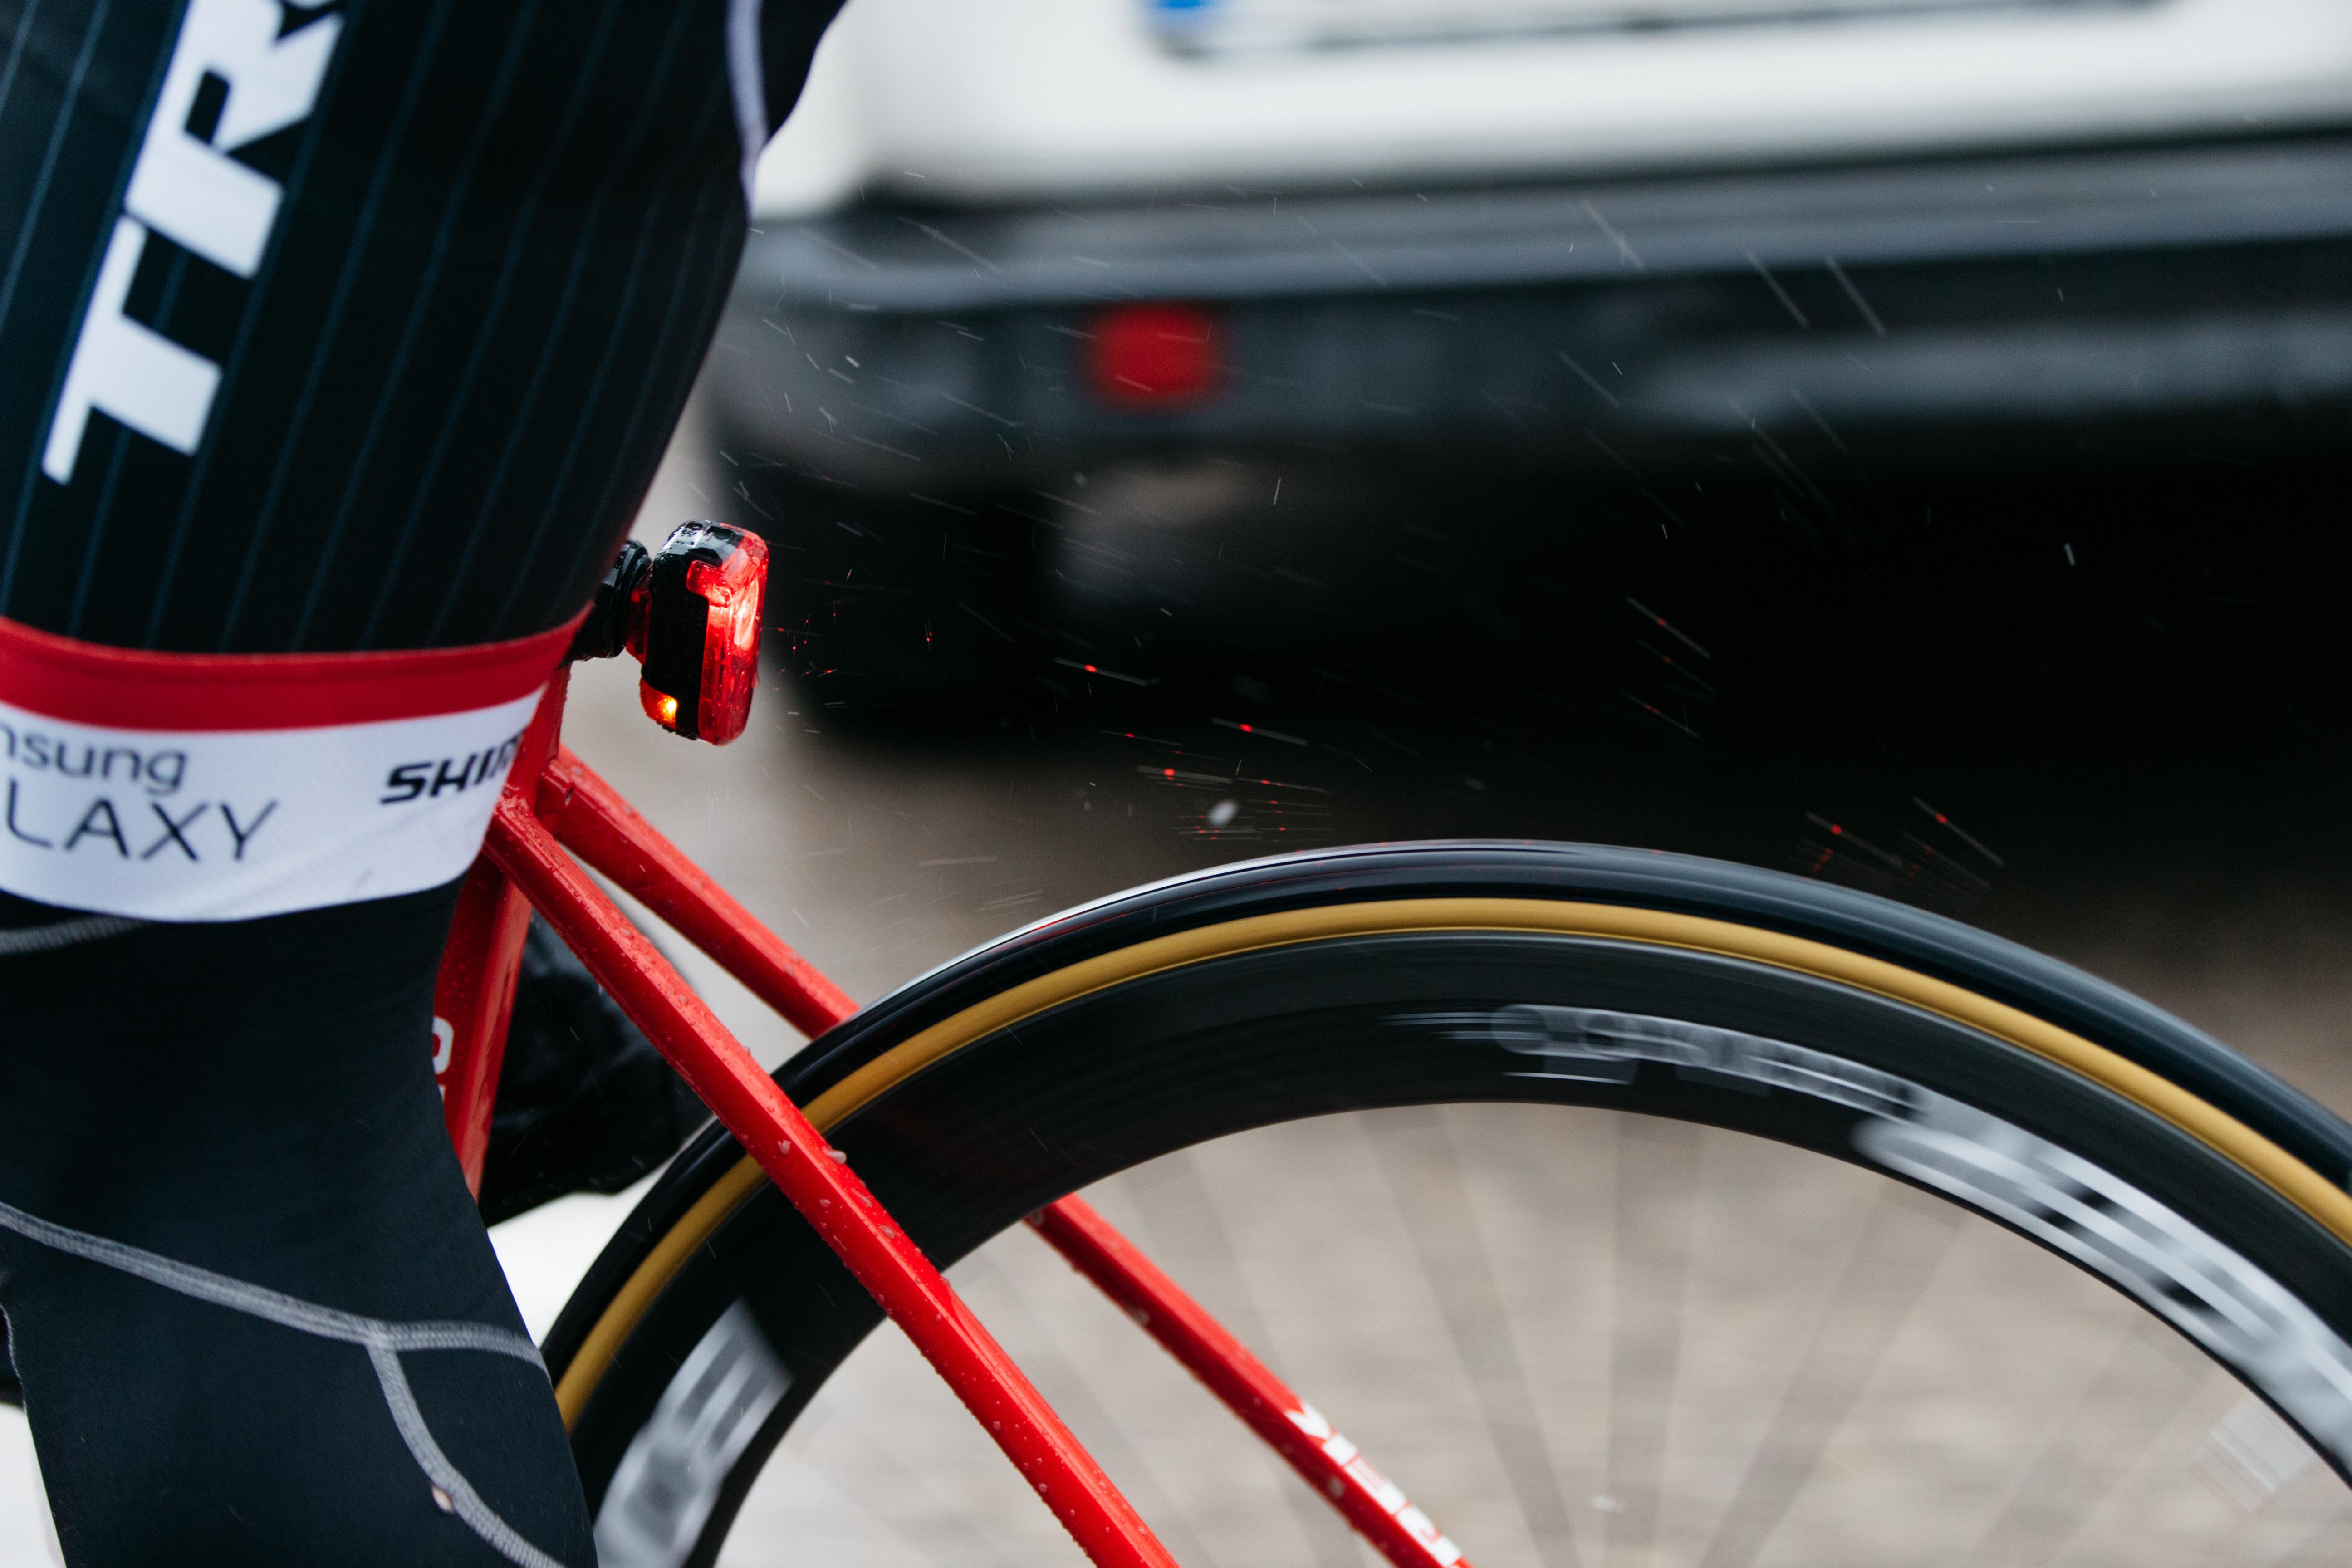 Luci bicicletta da corsa londra in bicicletta visitlondon